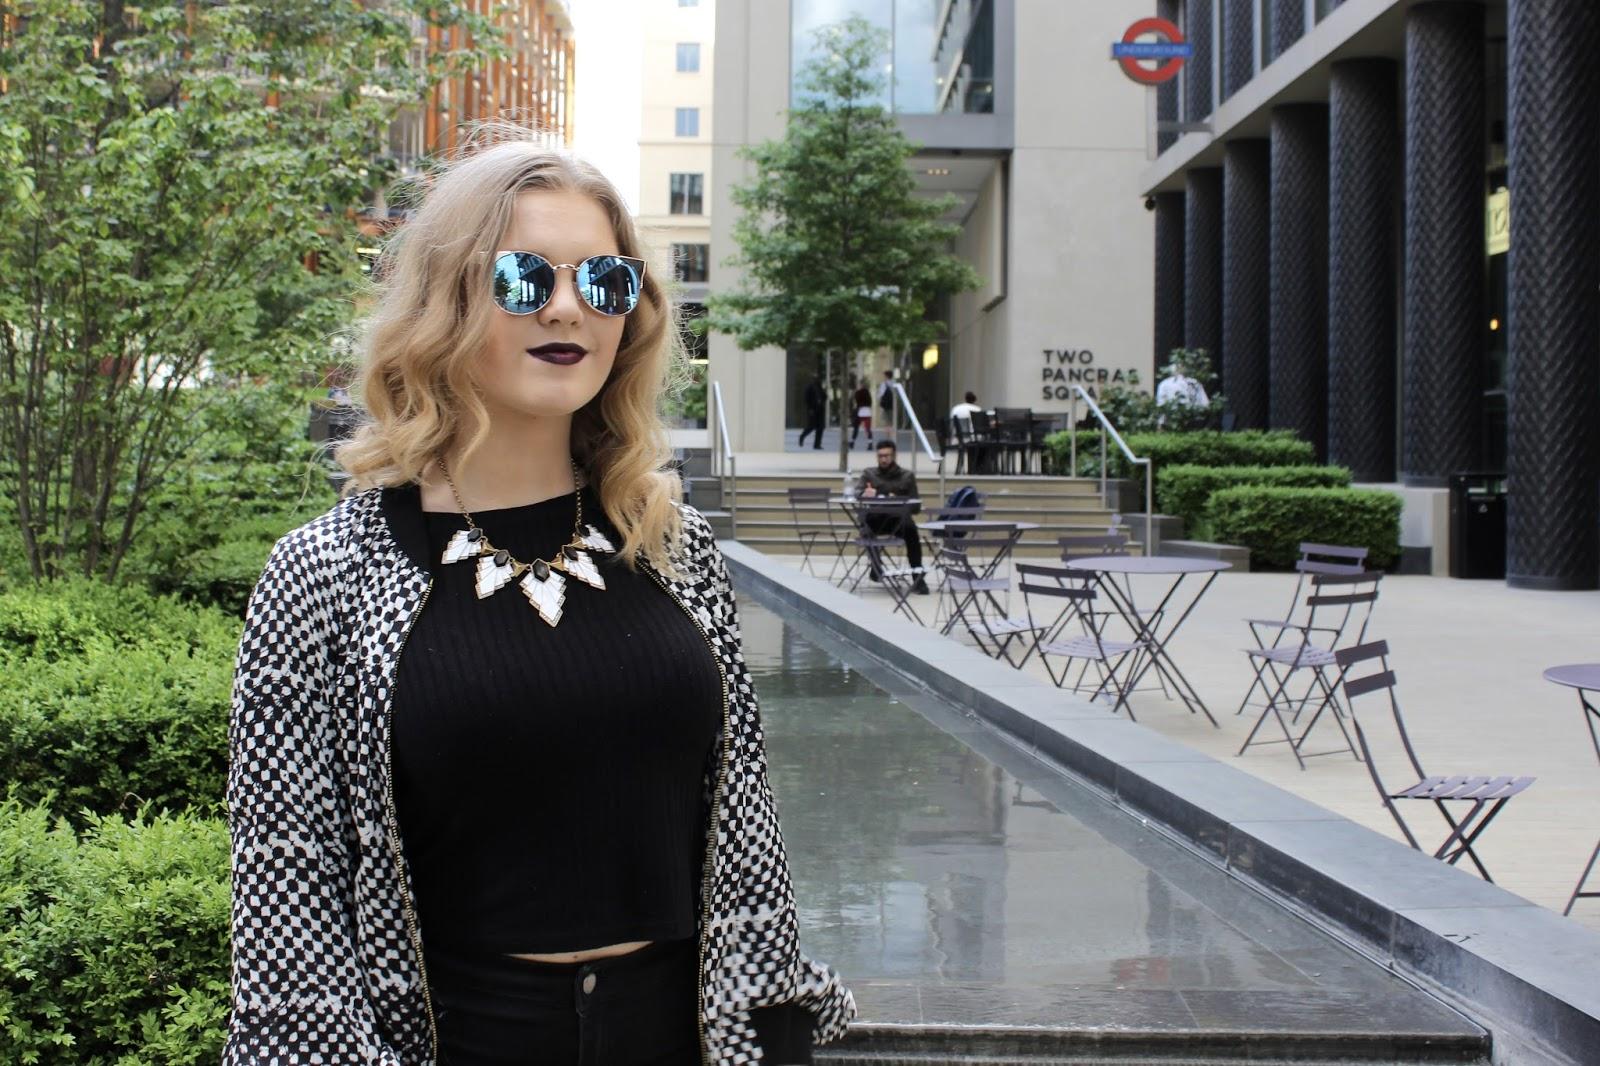 ootd fashion michael kors jacket  quay sunglasses topshop joni jeans nike air max thea blogger fashion